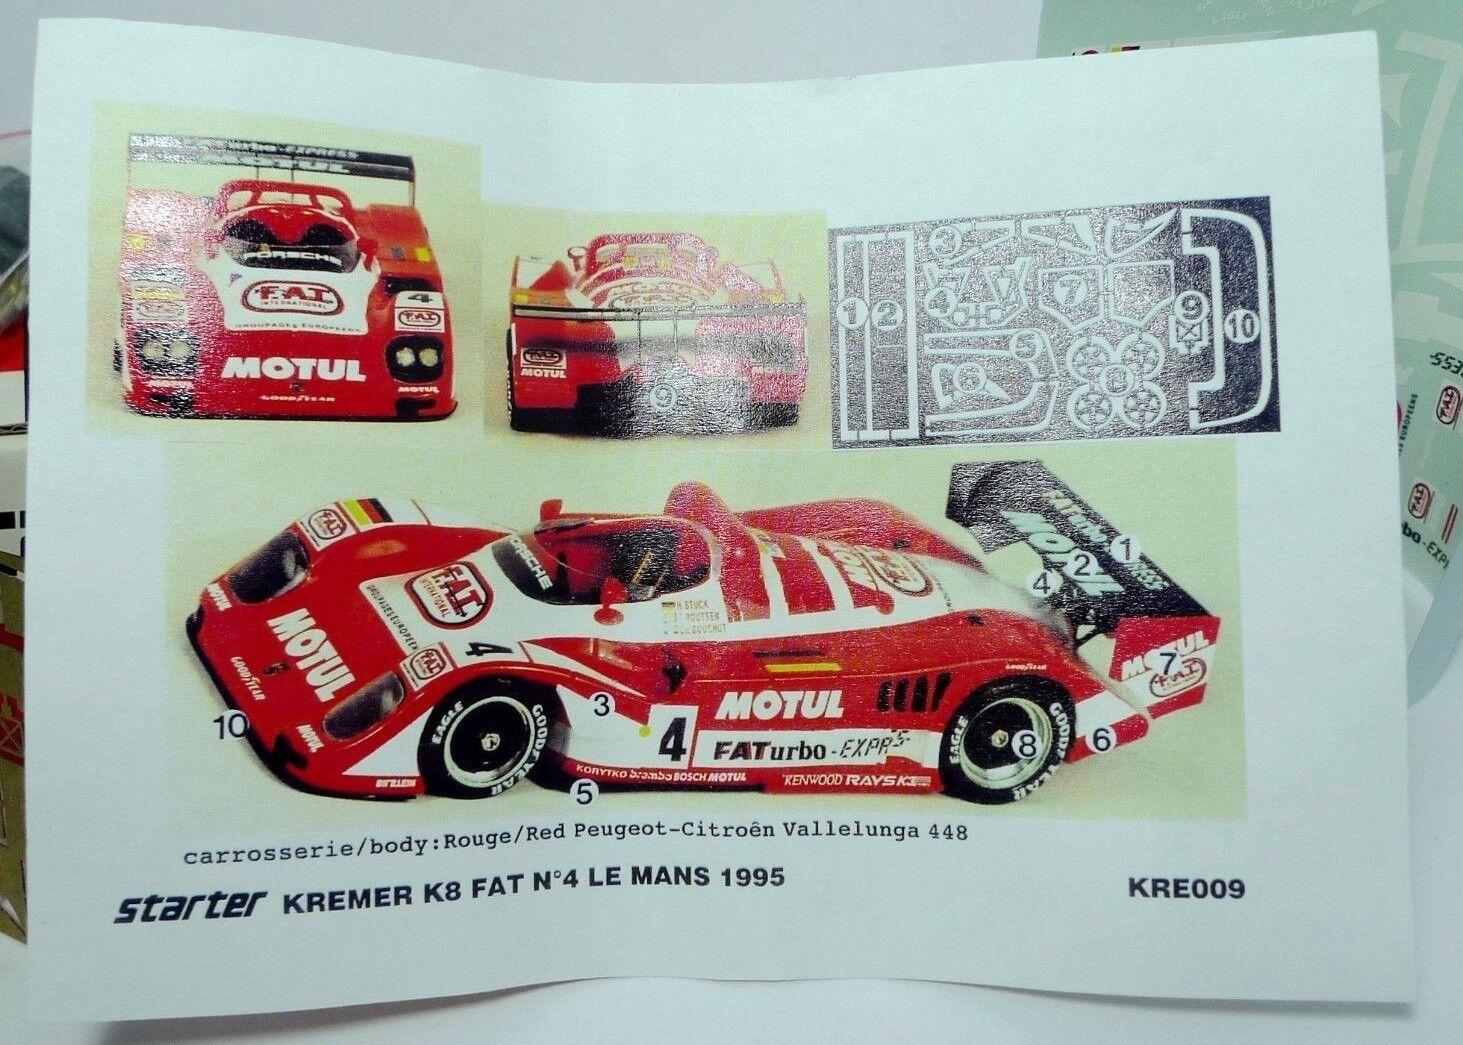 Kit Starter 1 43  -  PORSCHE KB F.A.T N°4 LE MANS 1995